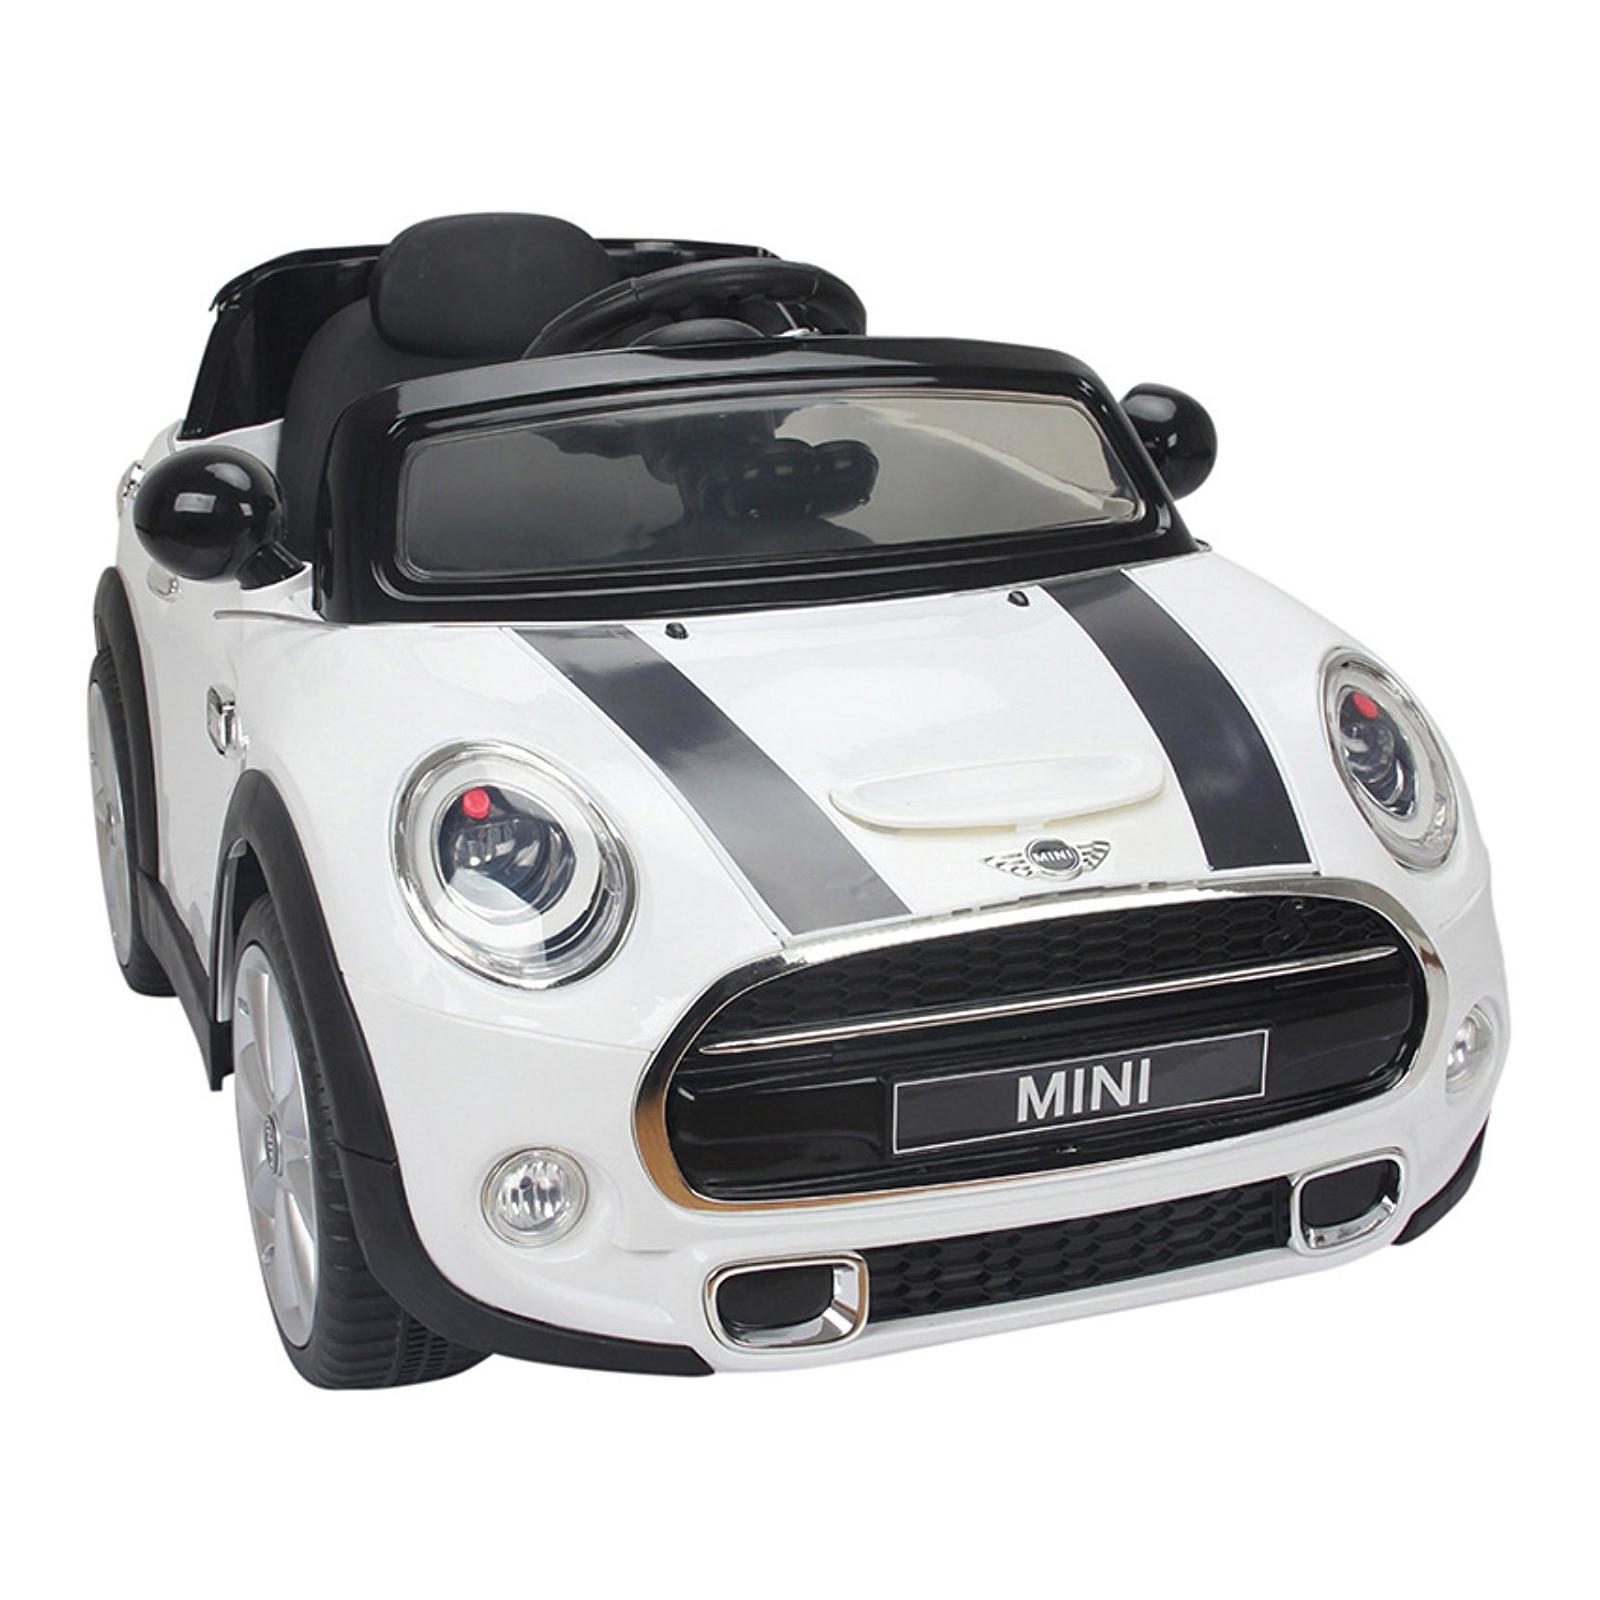 Mini Cooper Kids Ride On Car - White